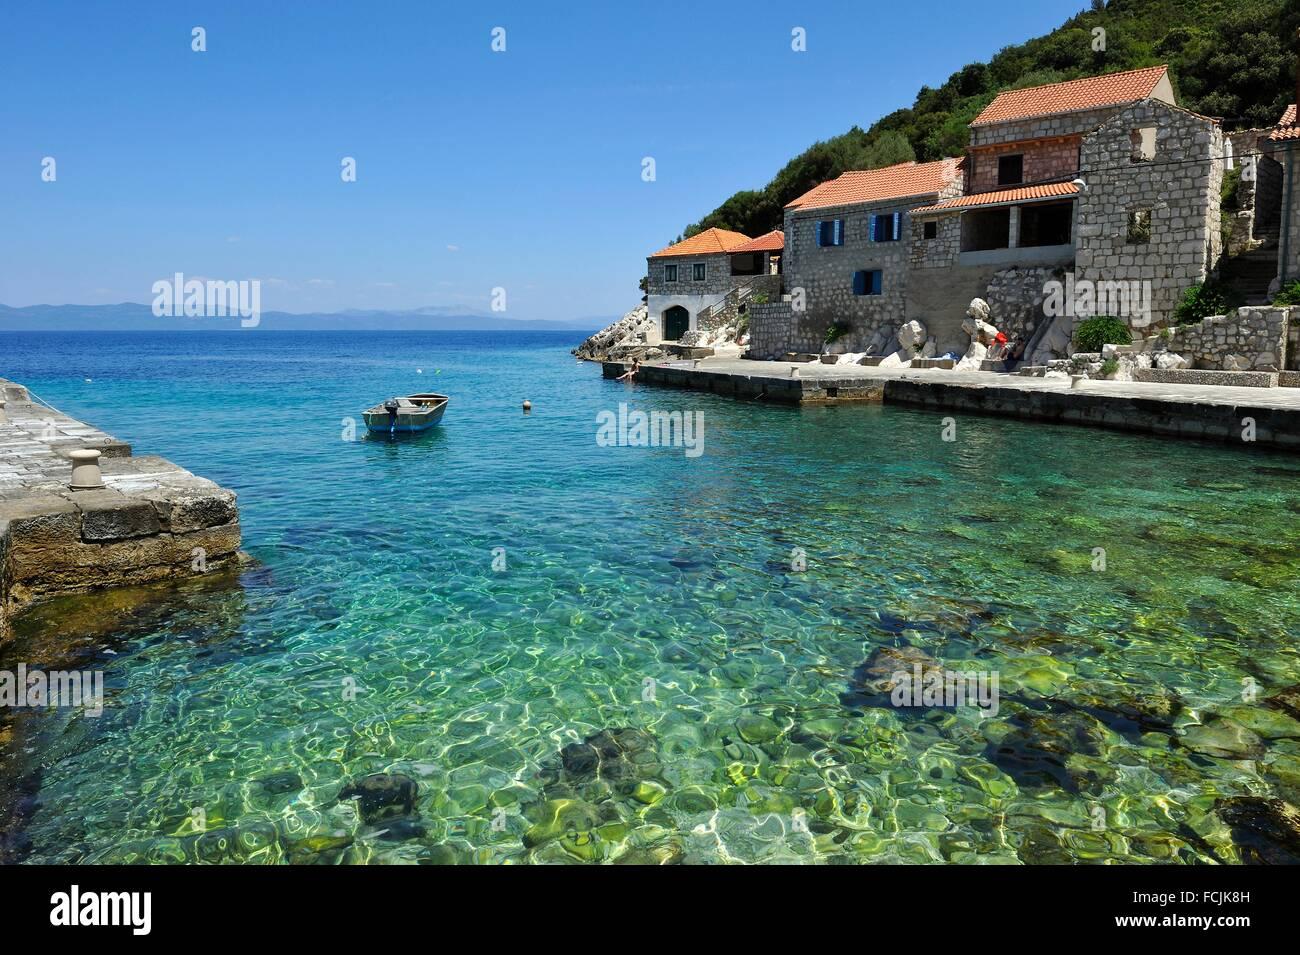 protected historic site of Lucica, a former fishermen settlement near Lastovo town, Lastovo island, Croatia, Southeast - Stock Image